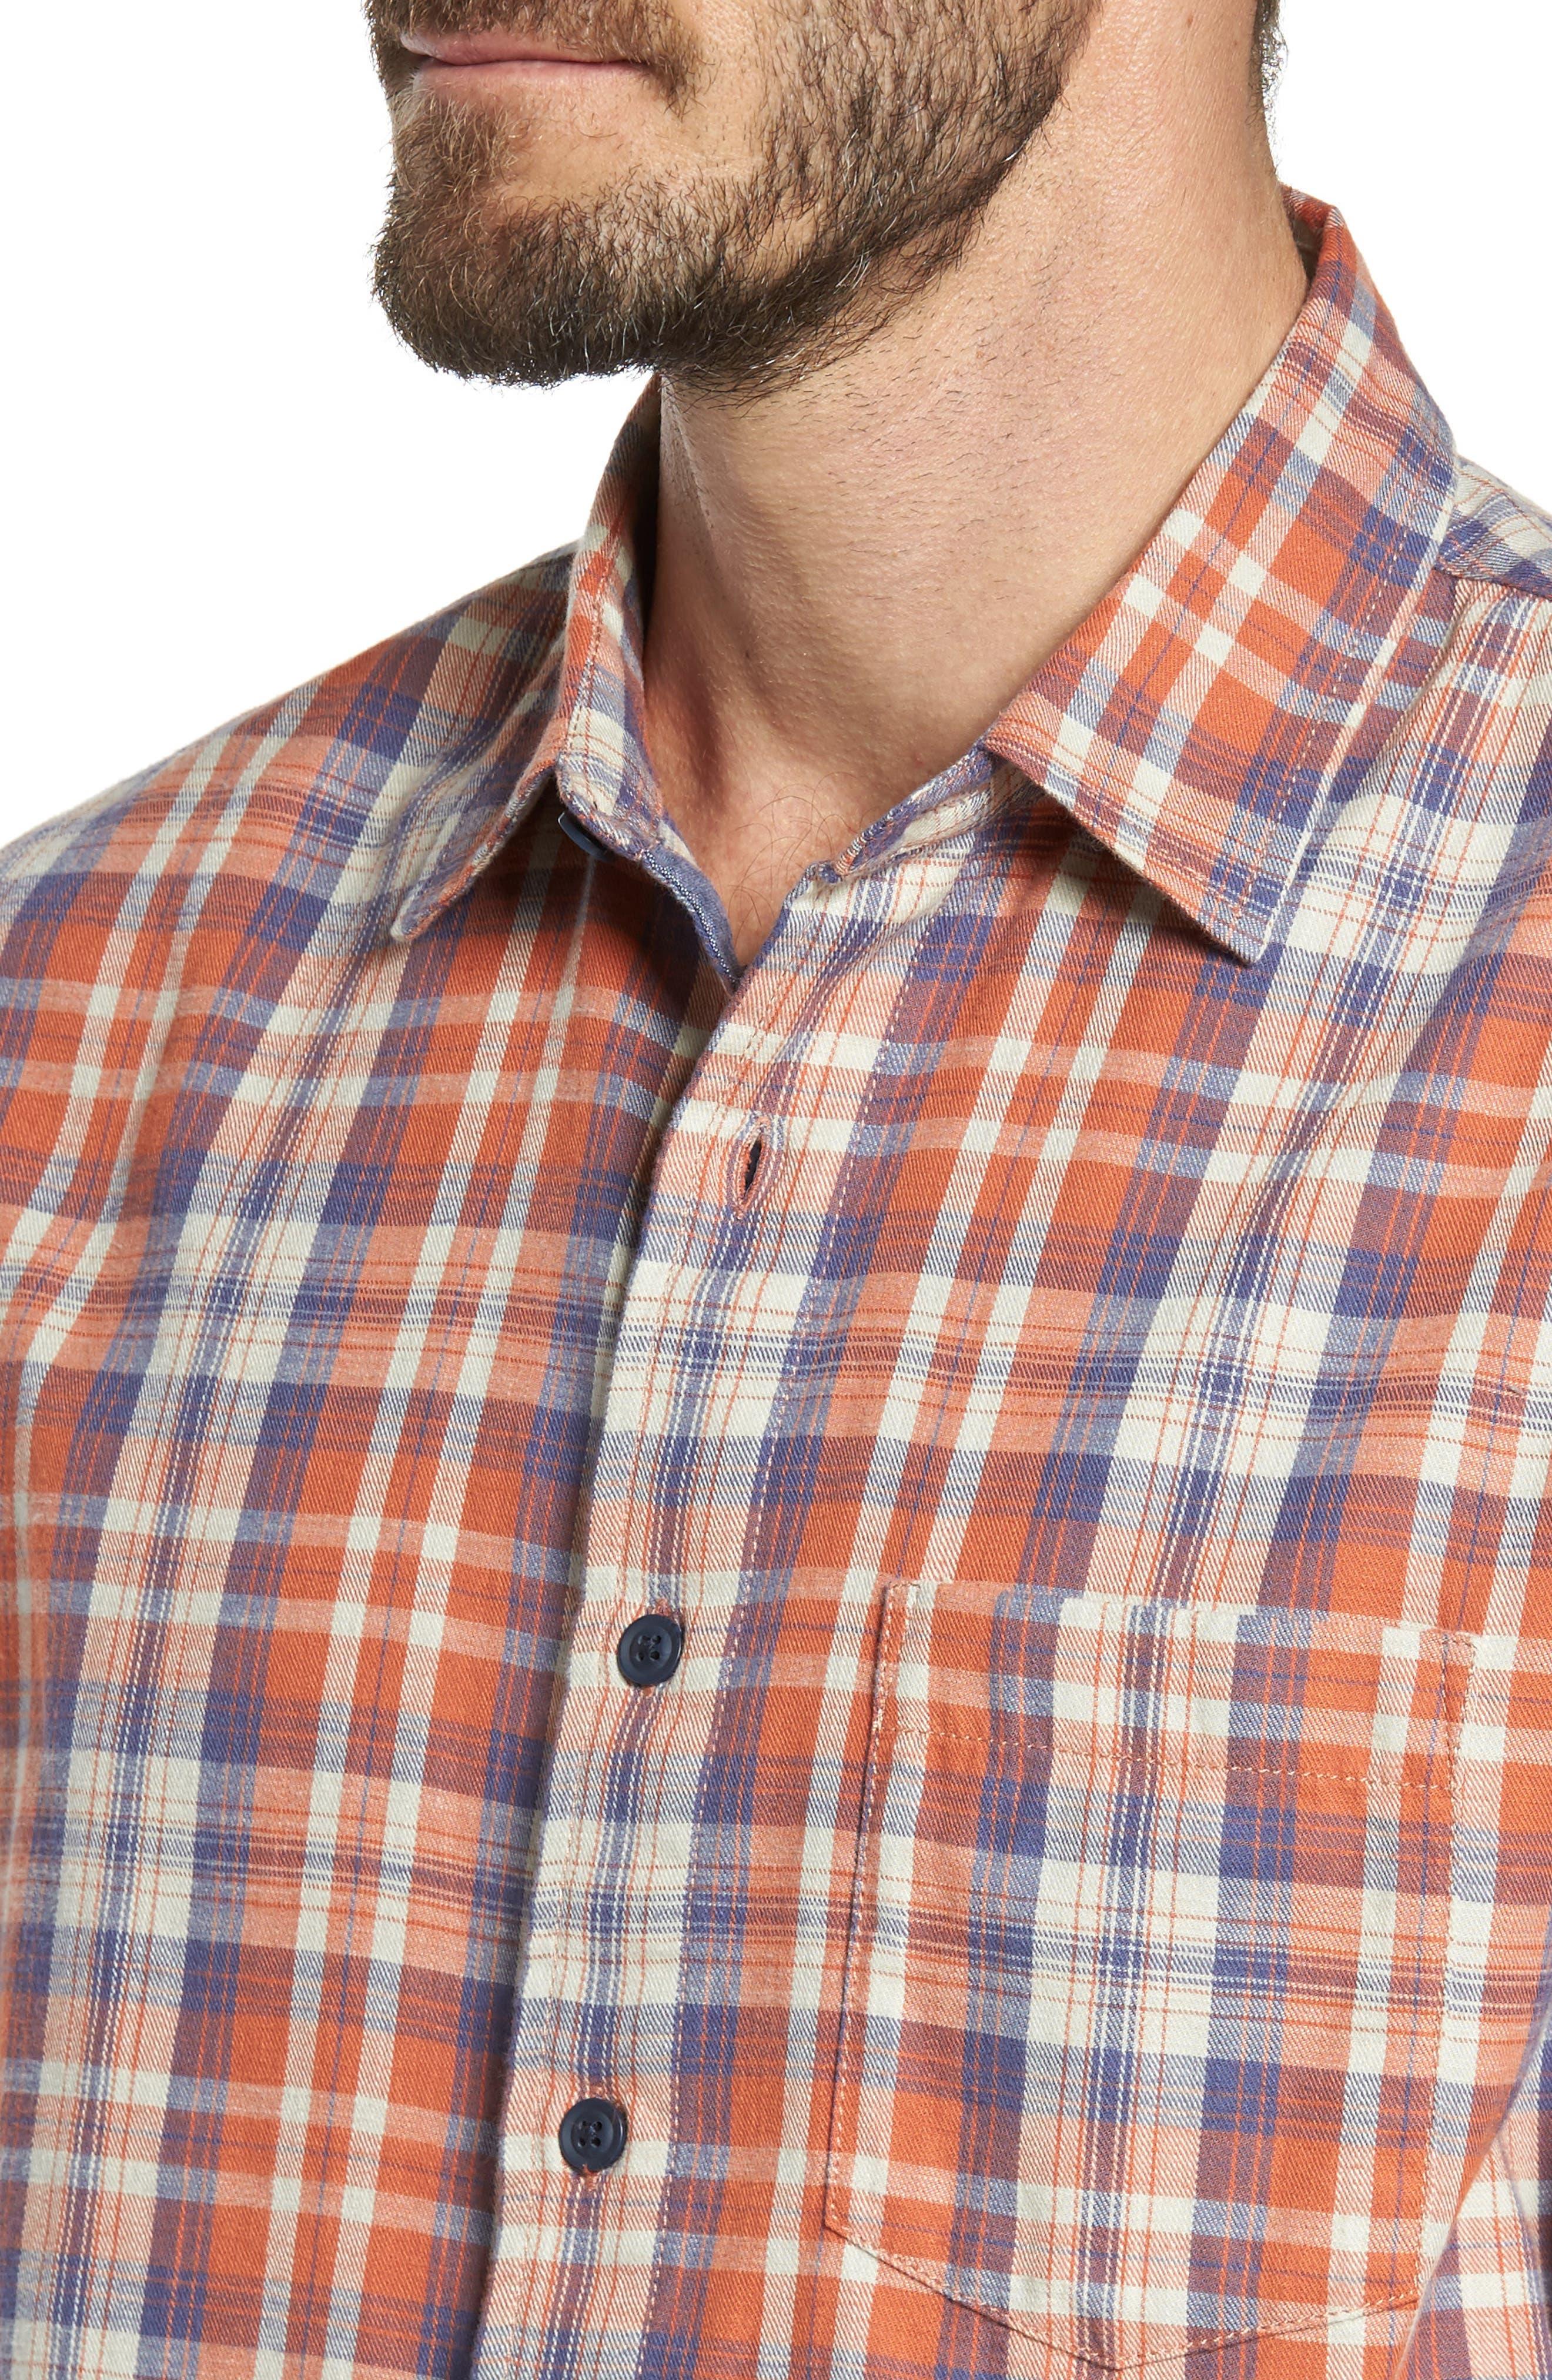 Scottsdale Slim Fit Plaid Slub Twill Sport Shirt,                             Alternate thumbnail 4, color,                             840